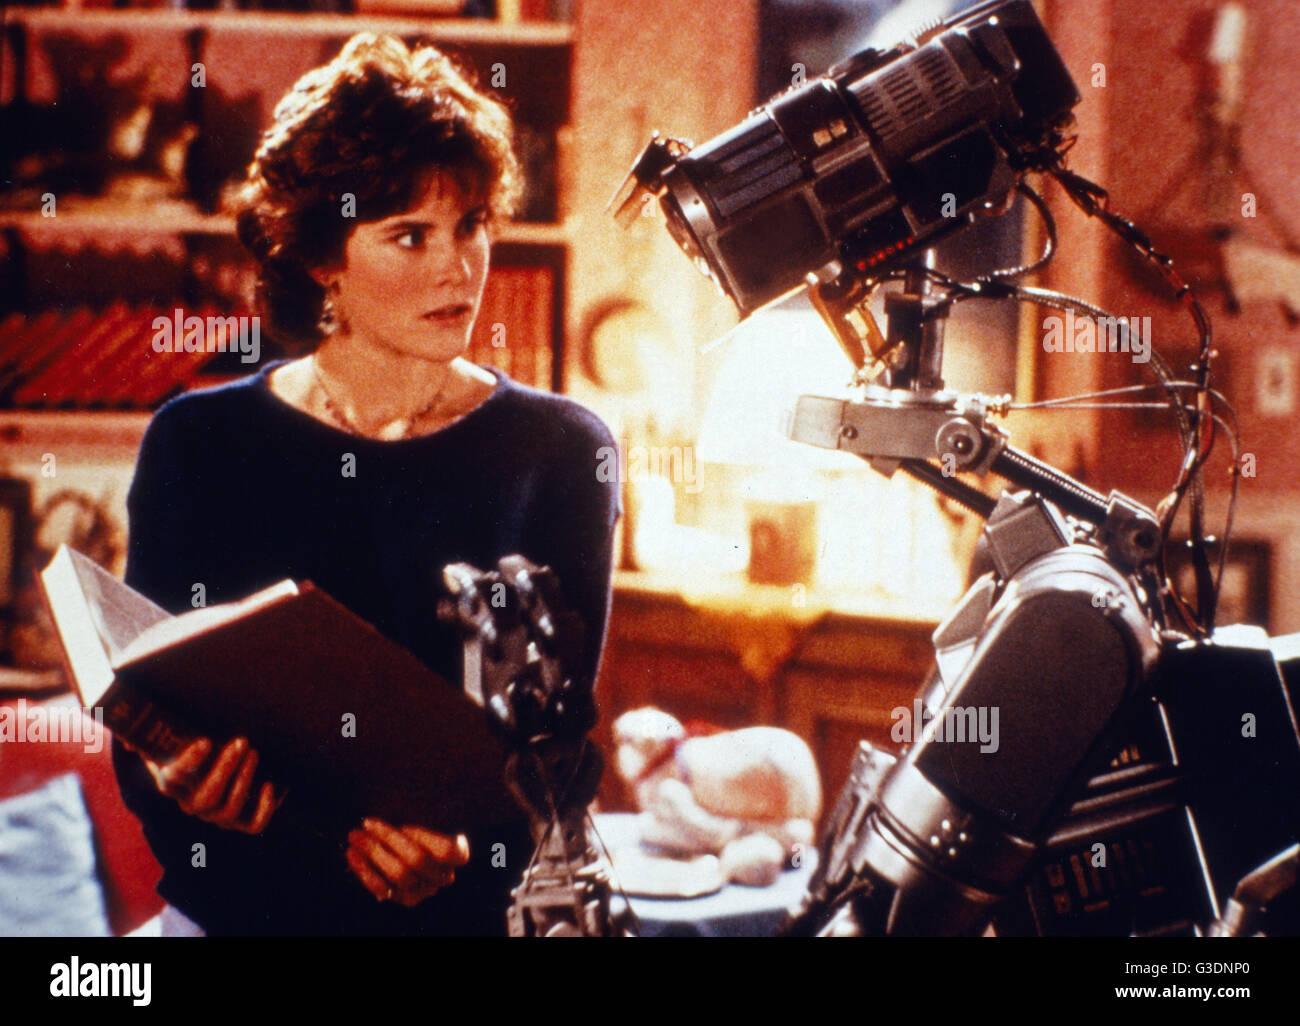 Short Circuit 1986 Stock Photos Images 10 Johnny 5 From And 2 Aka Nummer Lebt Usa Regie John